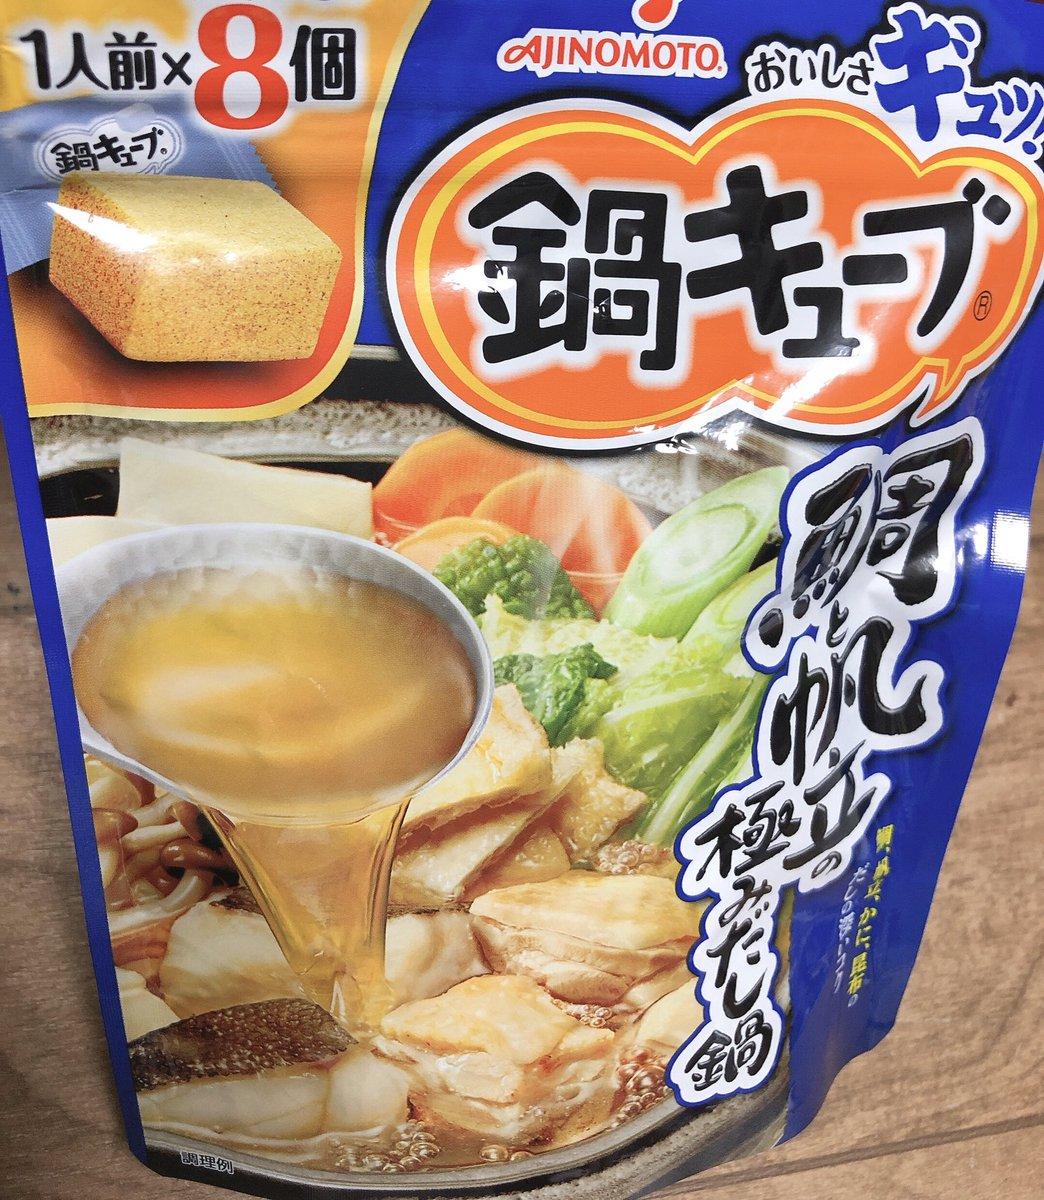 鍋 キューブ 雑炊